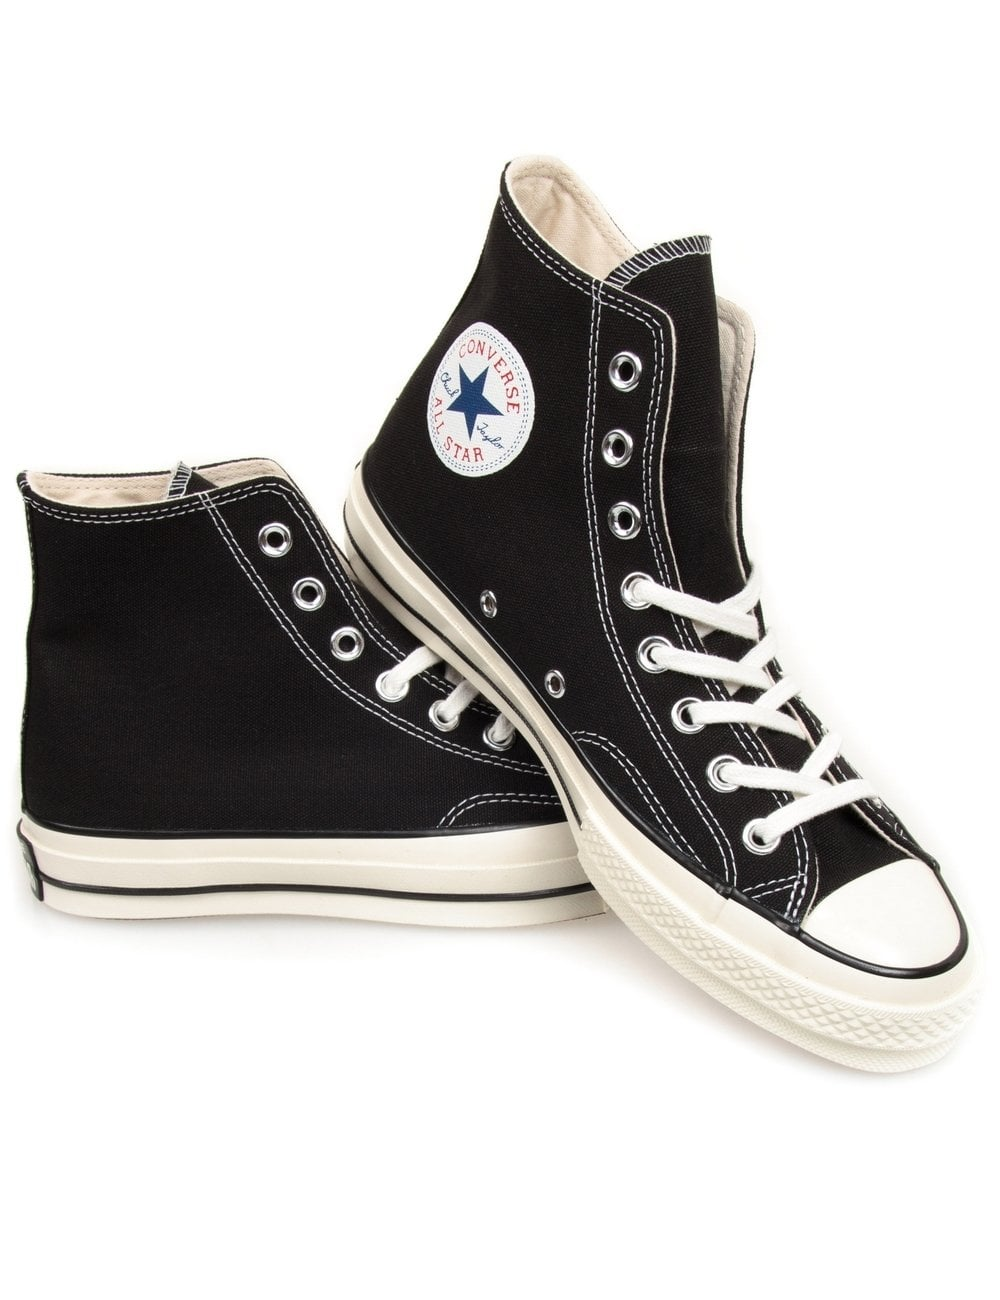 converse-chuck-taylor-70s-hi-boots-black-p9722-37230_image